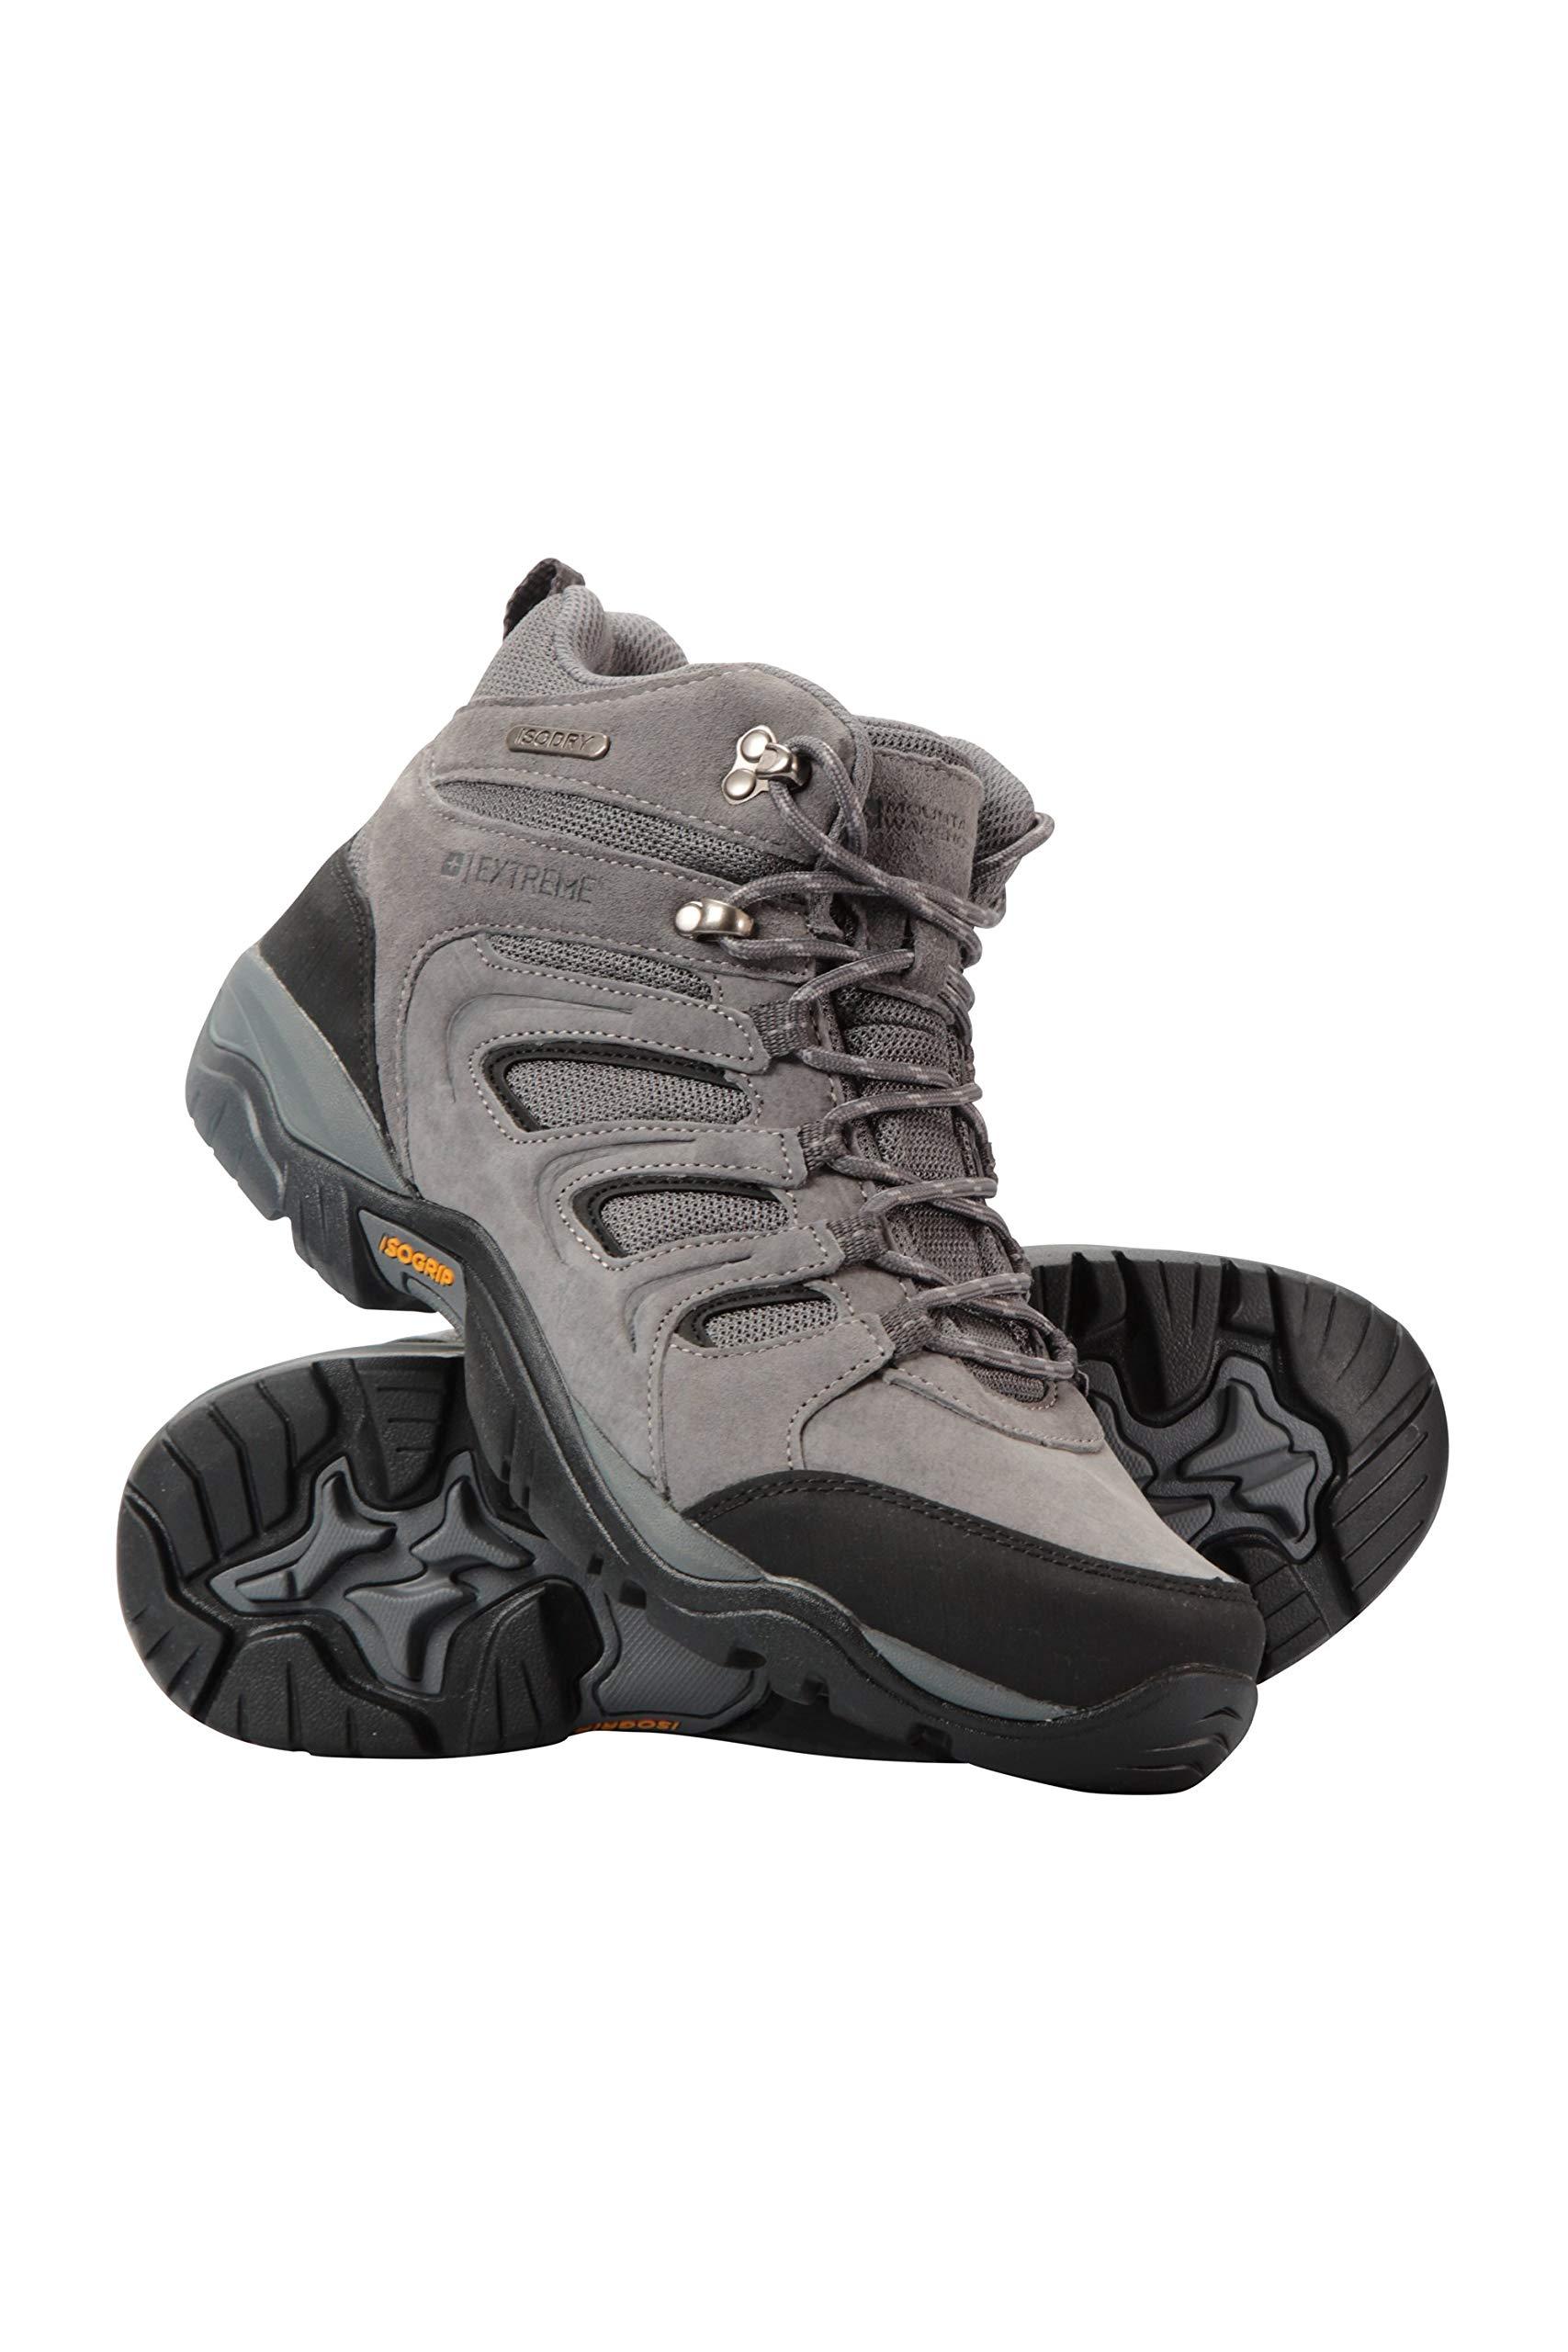 Mountain Warehouse Aspect Mens IsoGrip Boots -Waterproof Hiking Shoes Dark Grey 9 M US Men